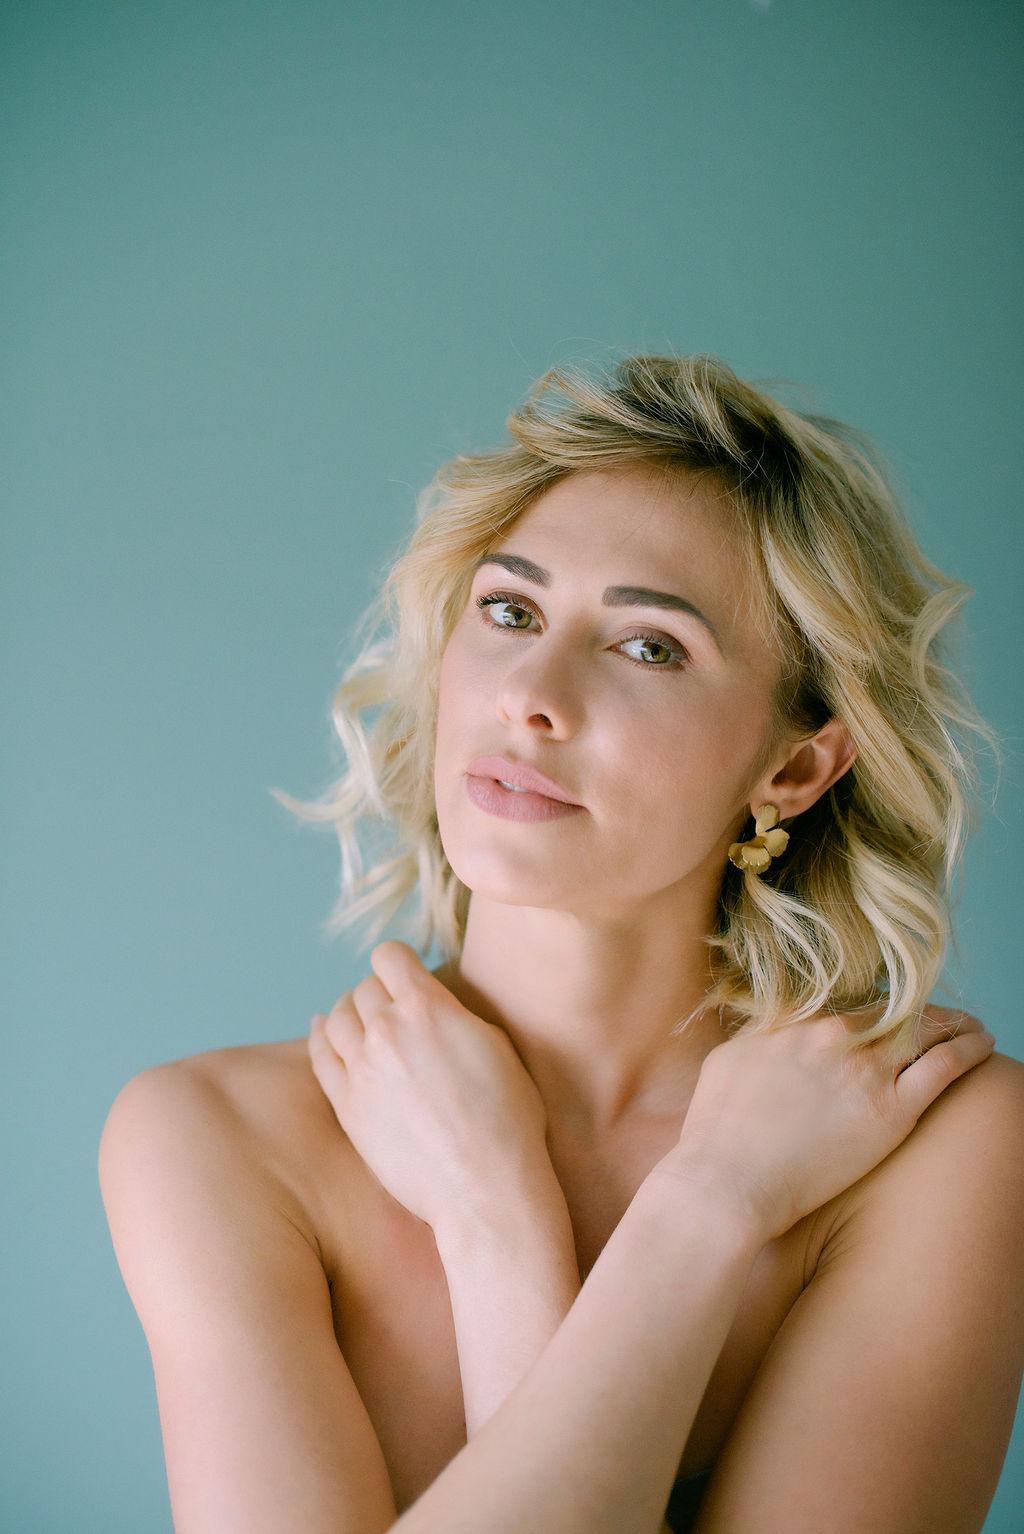 FashioneditorialSabben-Bo&luca-EmmanuelleMarty-webPhotography-12